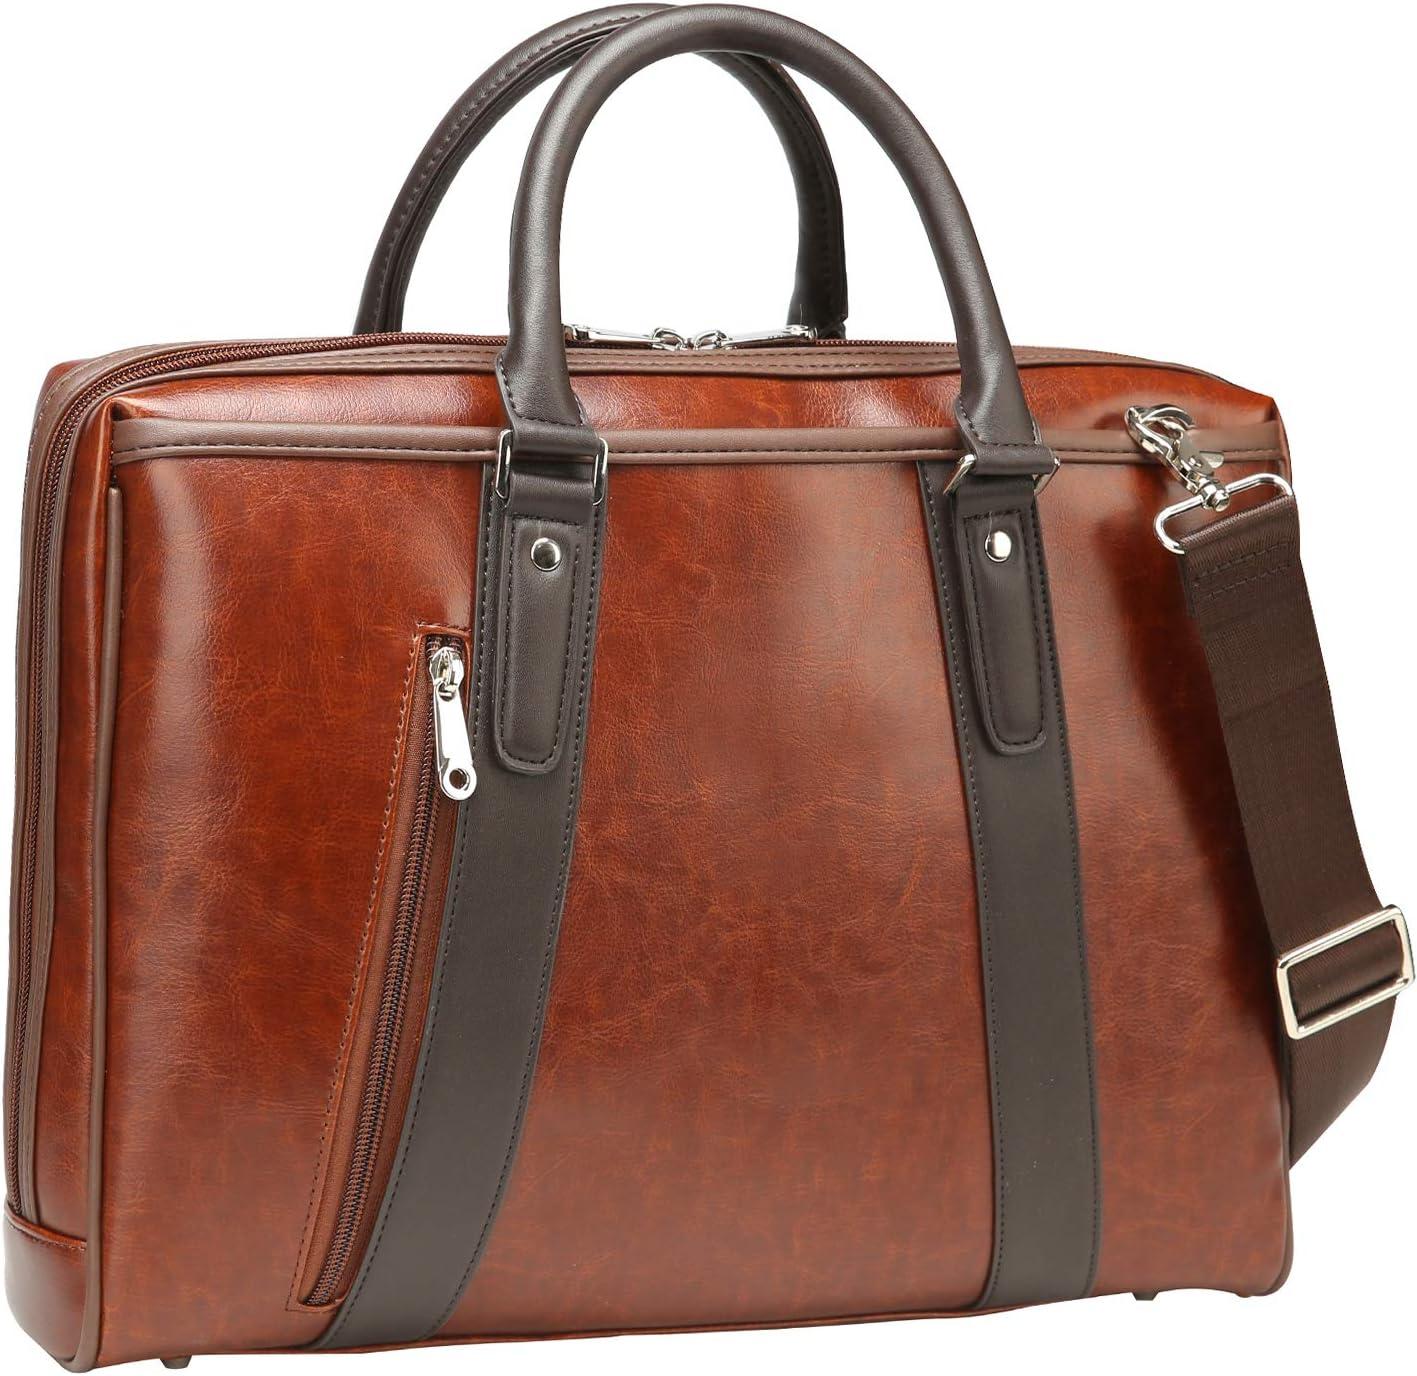 Ronts Brown PU Leather Laptop Briefcase for Men Women Business Messenger Bag Shoulder Handbag Office Work Tote Attache Case